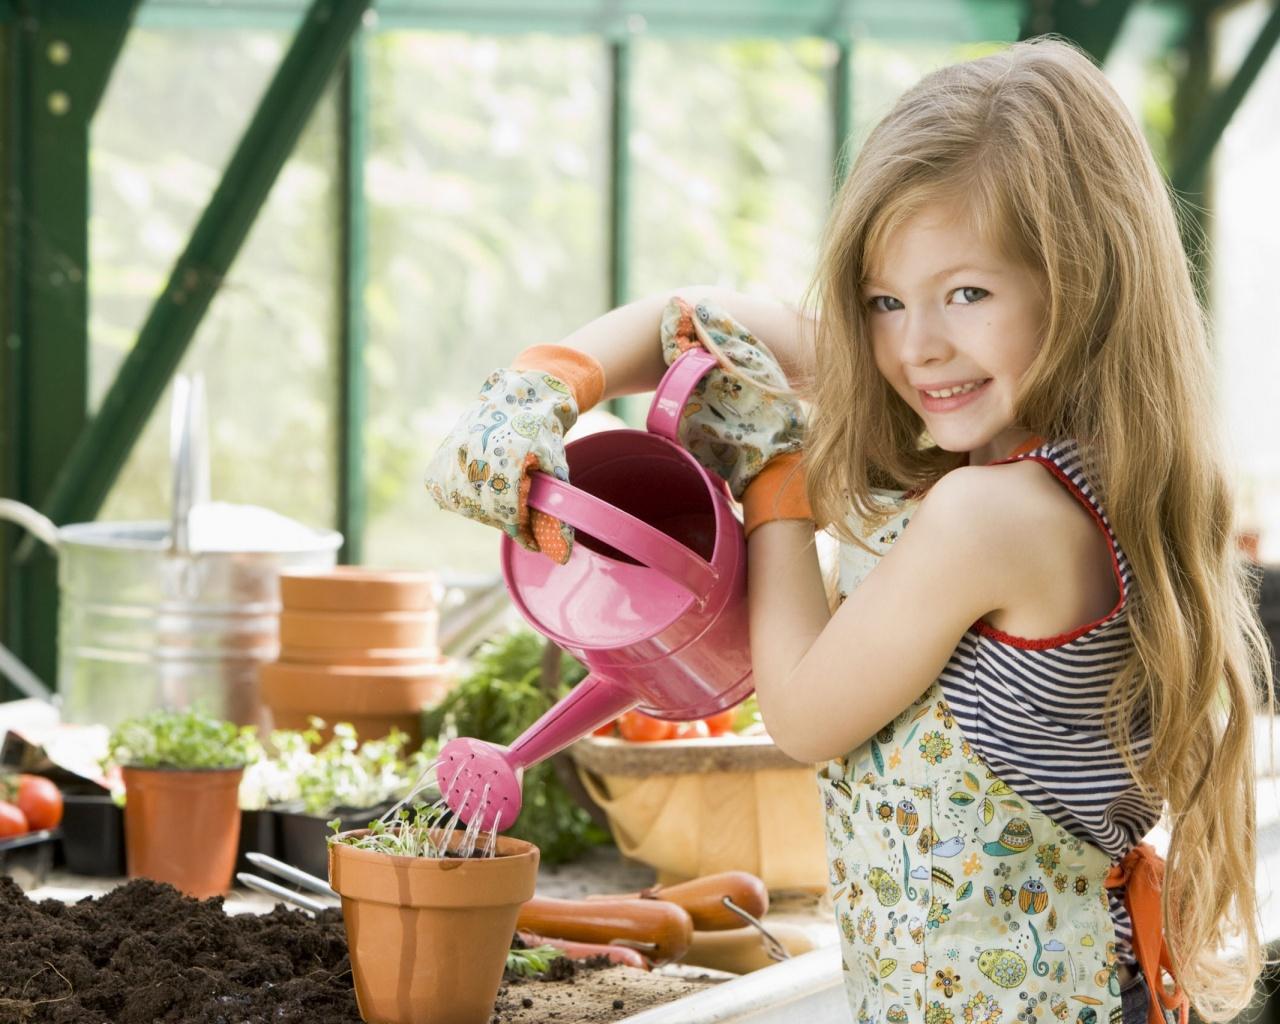 Детские фантазии цветов